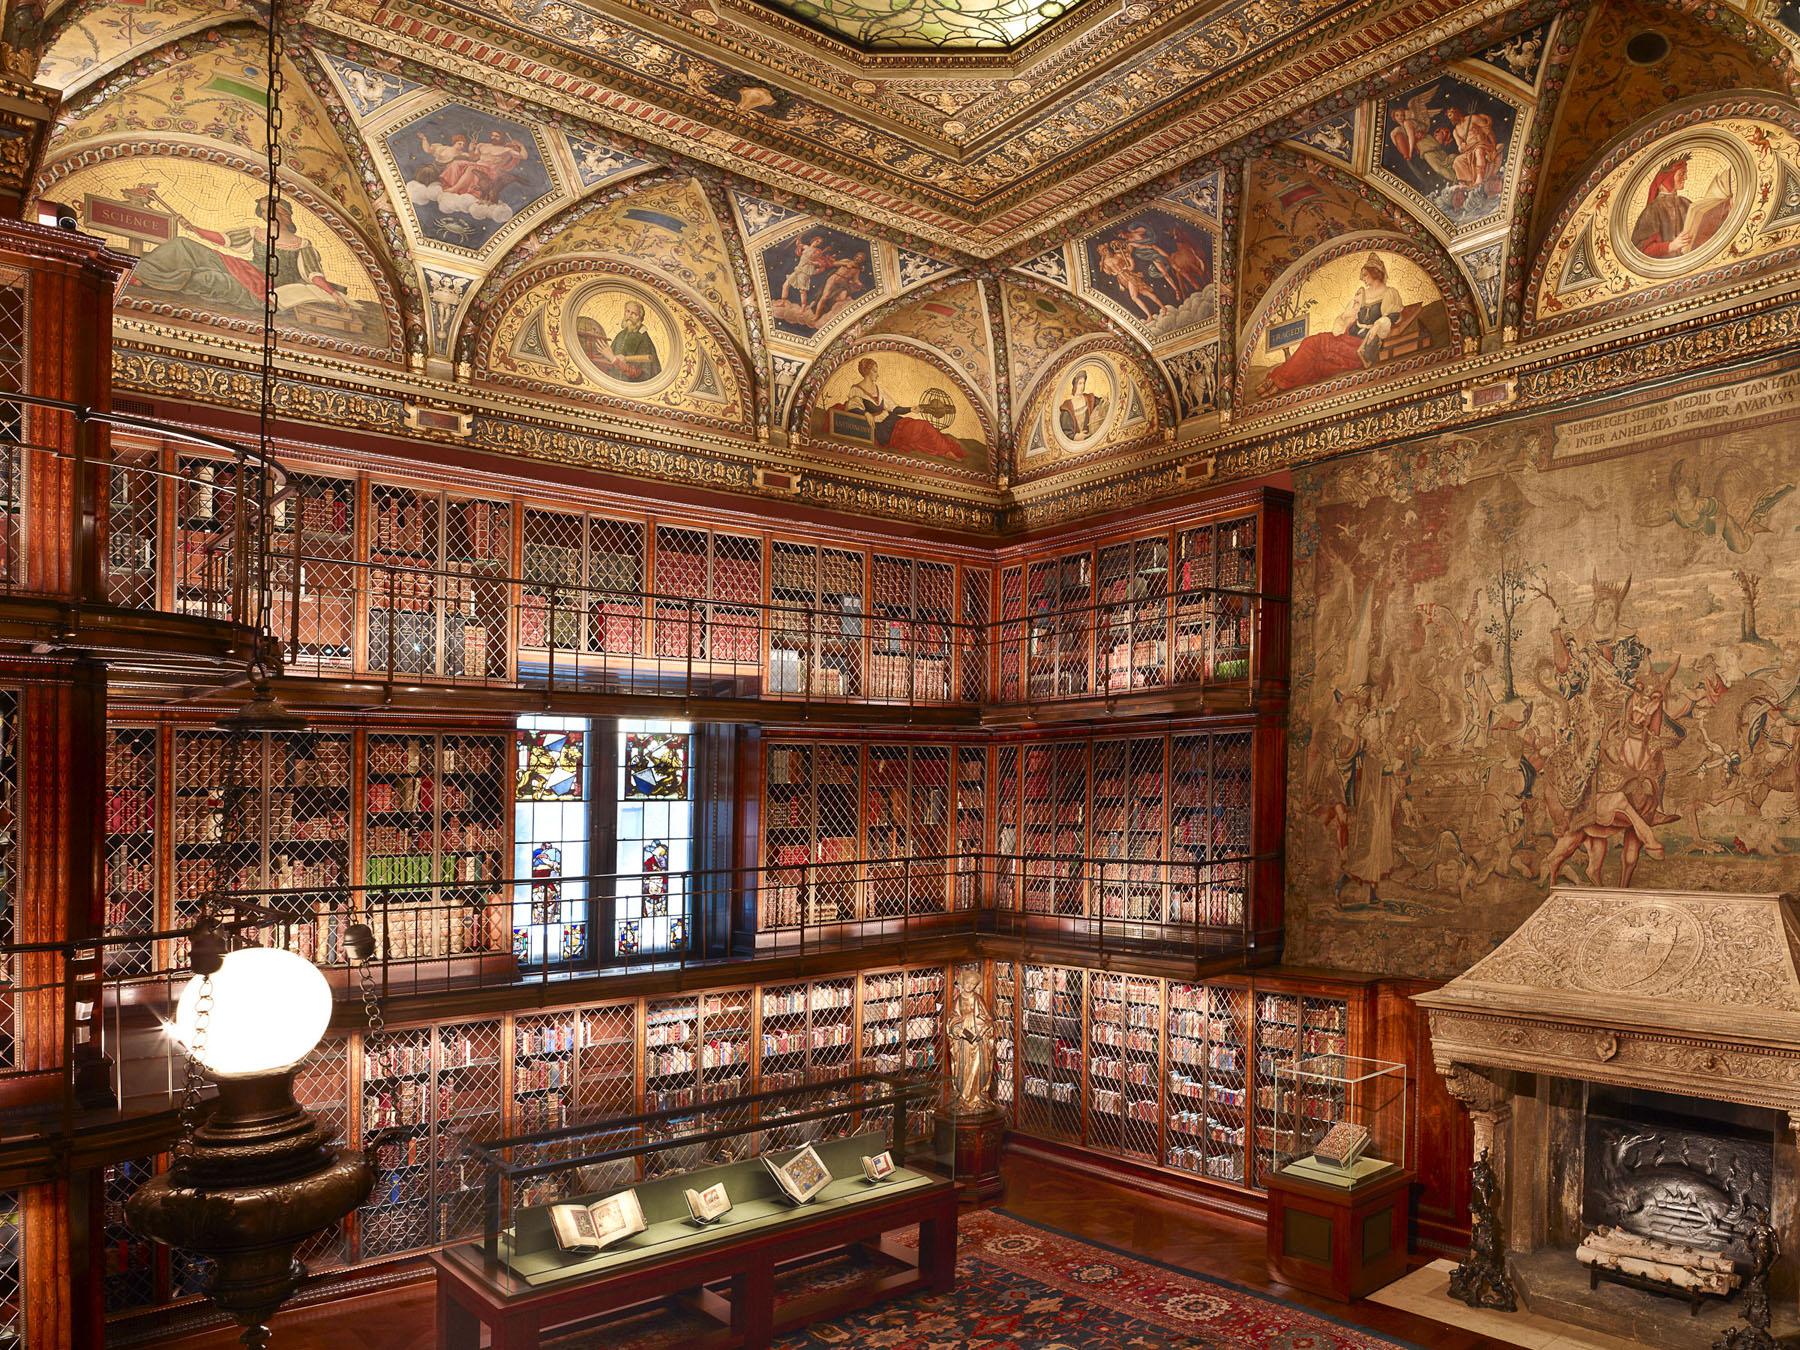 Interior of the Morgan Library